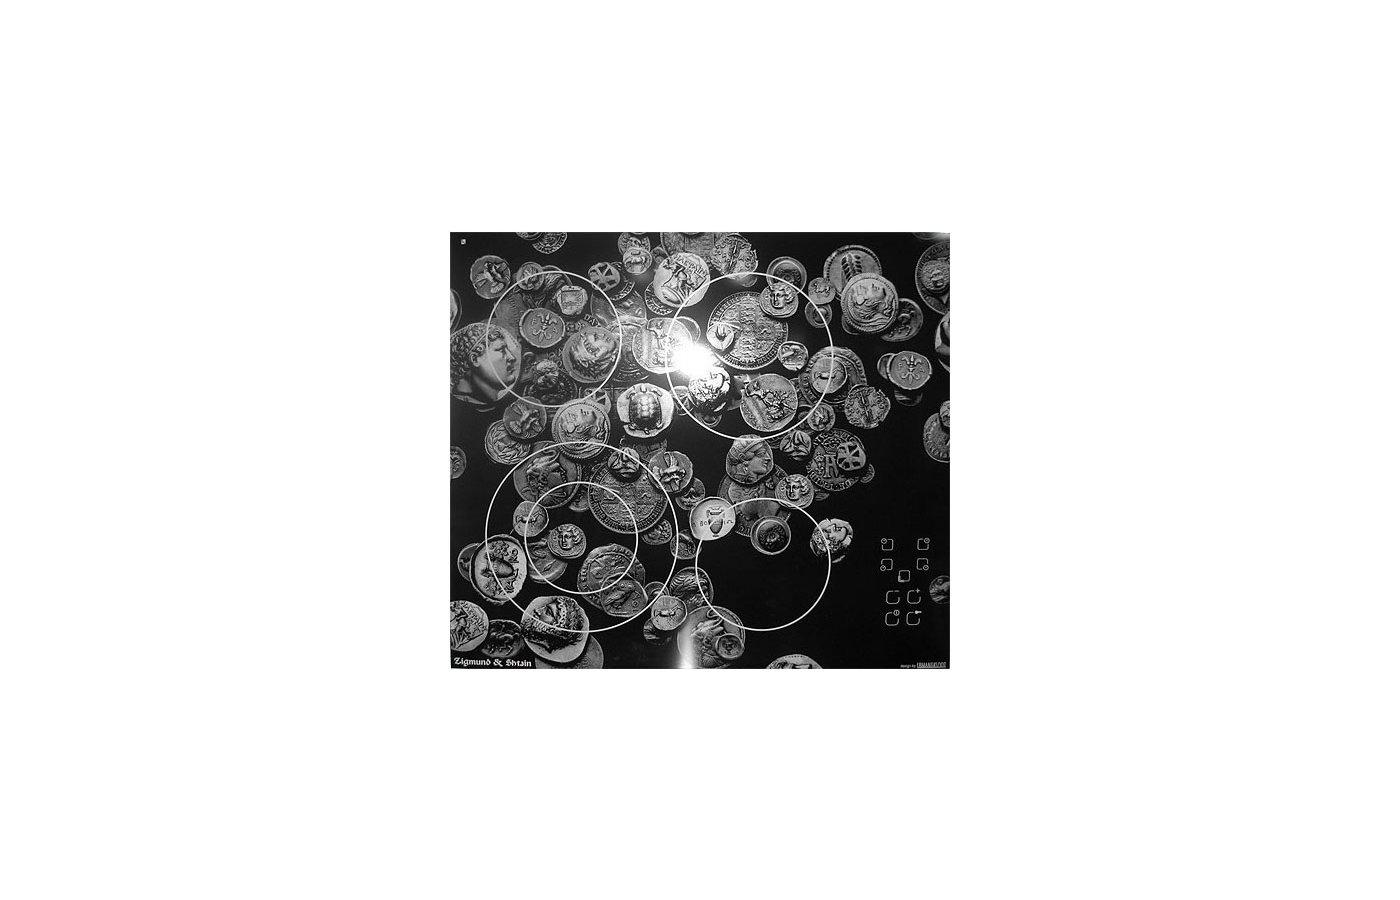 Варочная панель Zigmund & Shtain CNS 95.6 DX